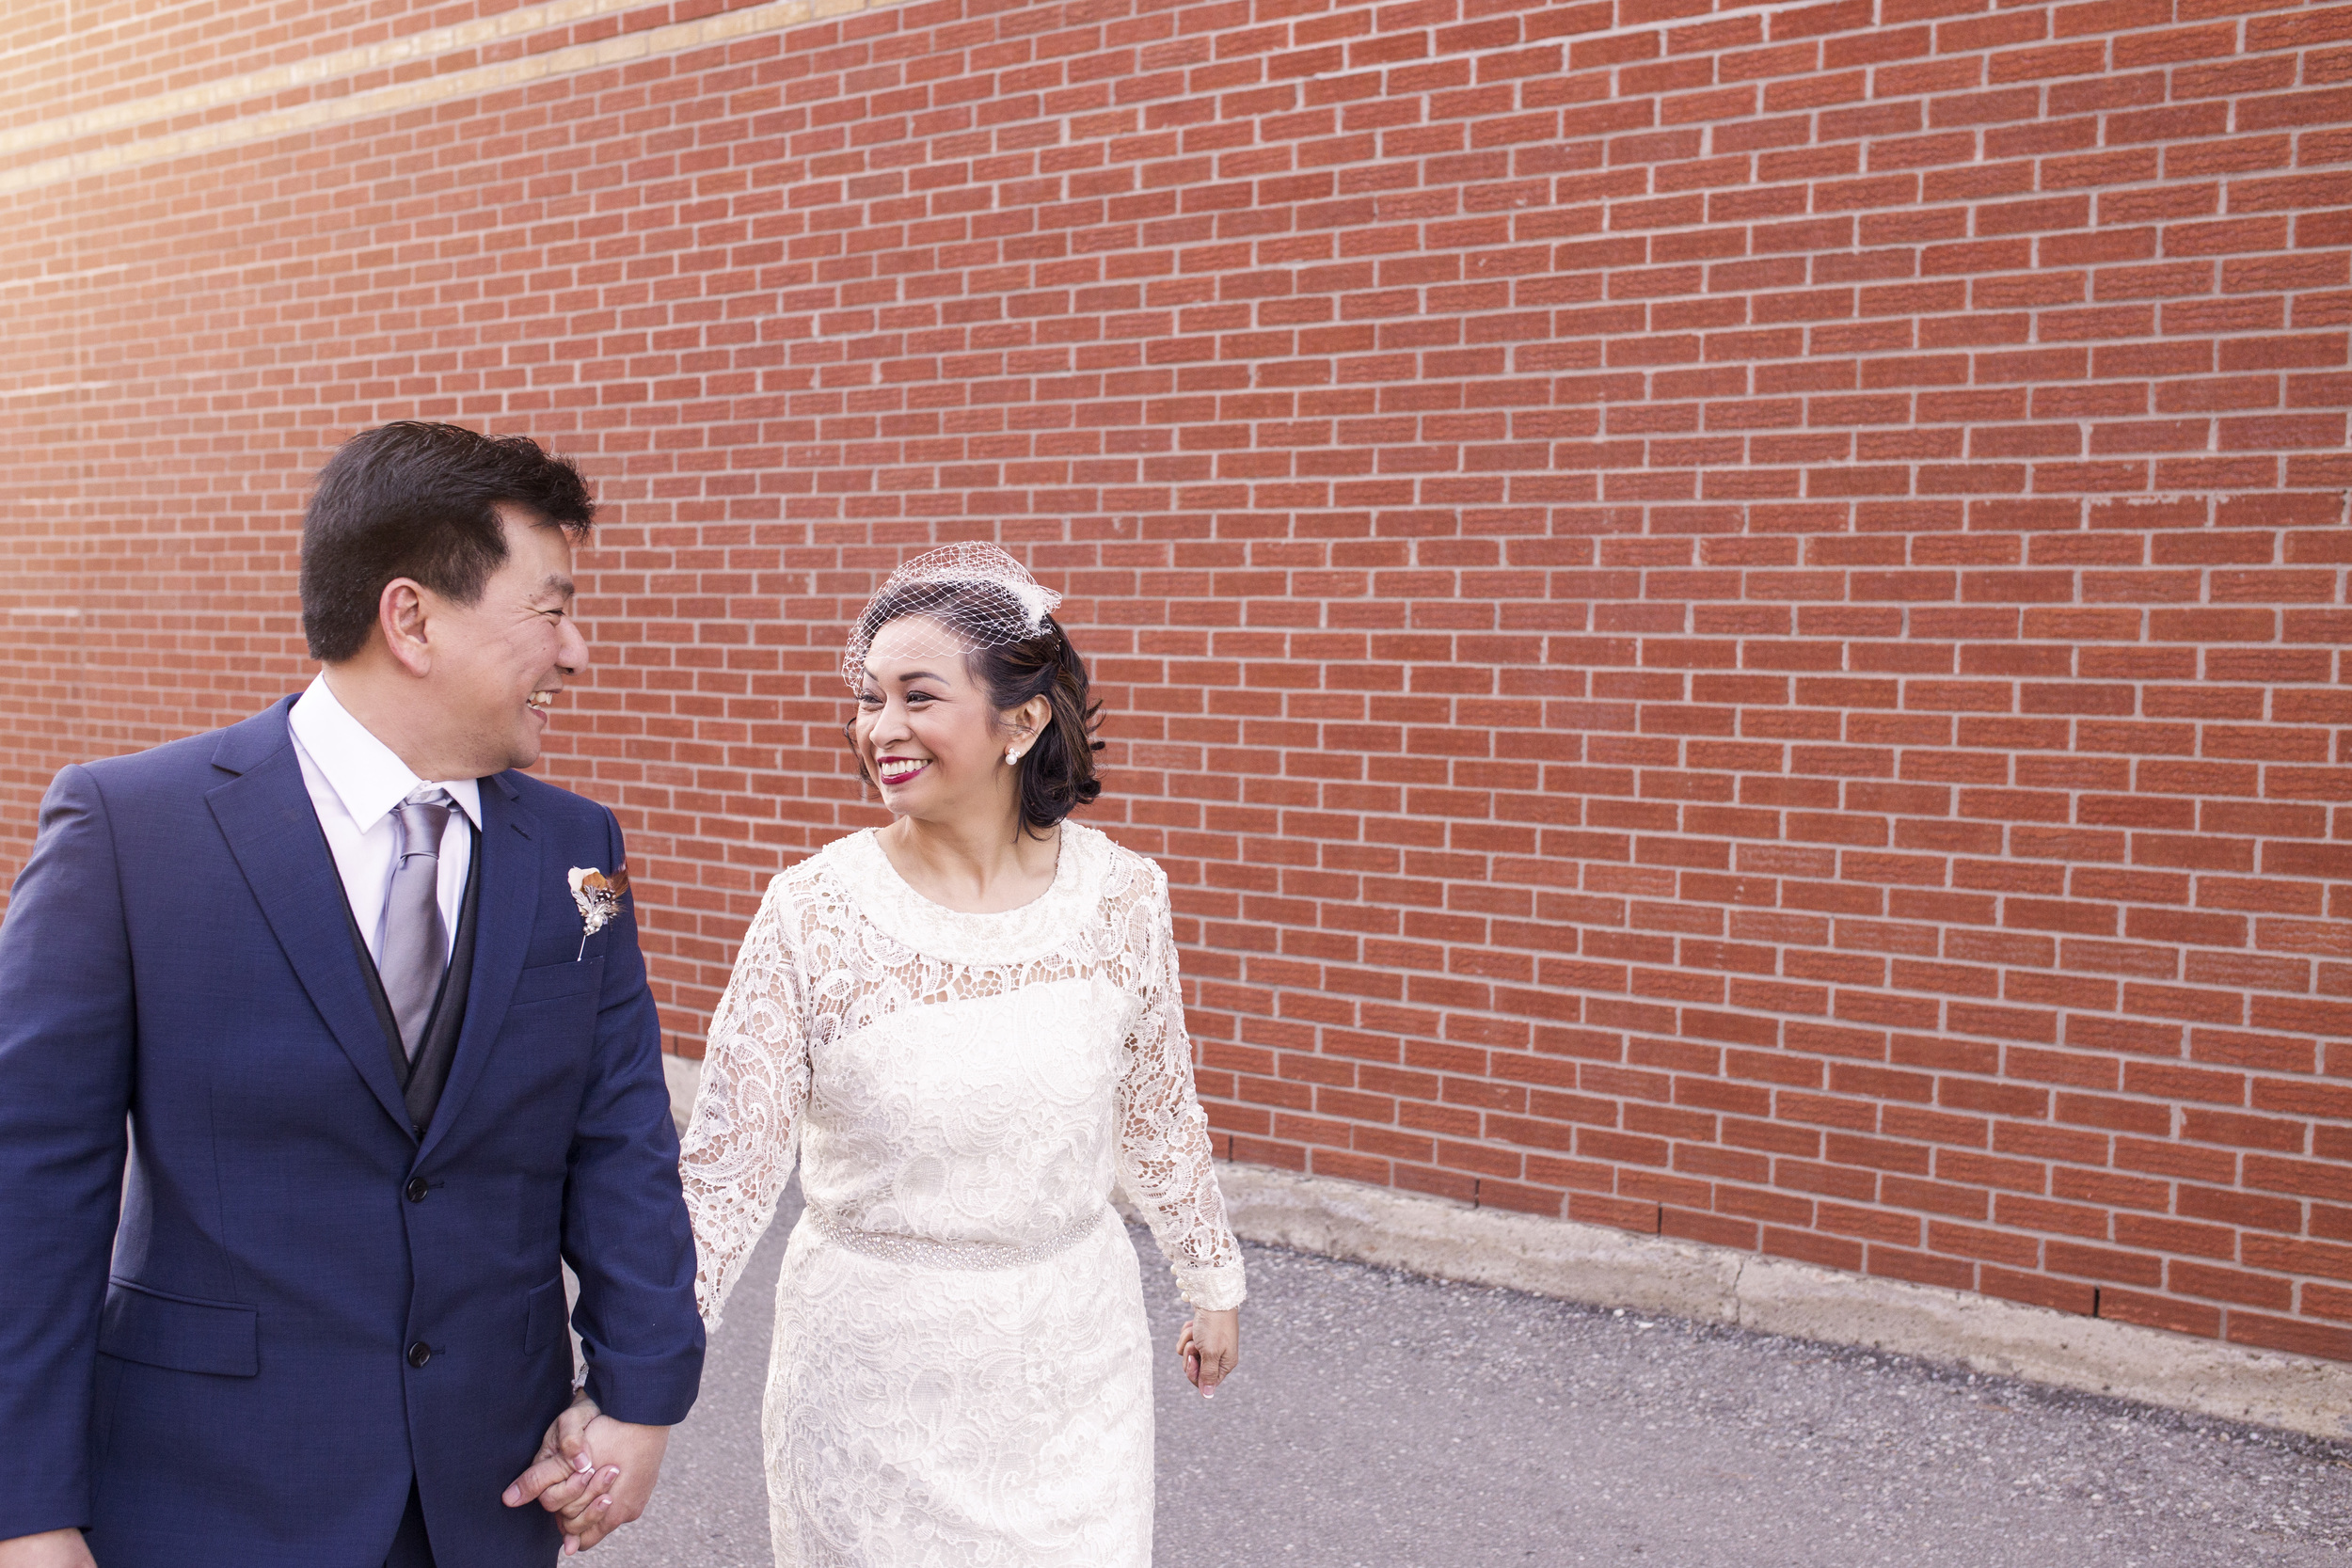 TorontoWeddingPhotographer7067.jpg